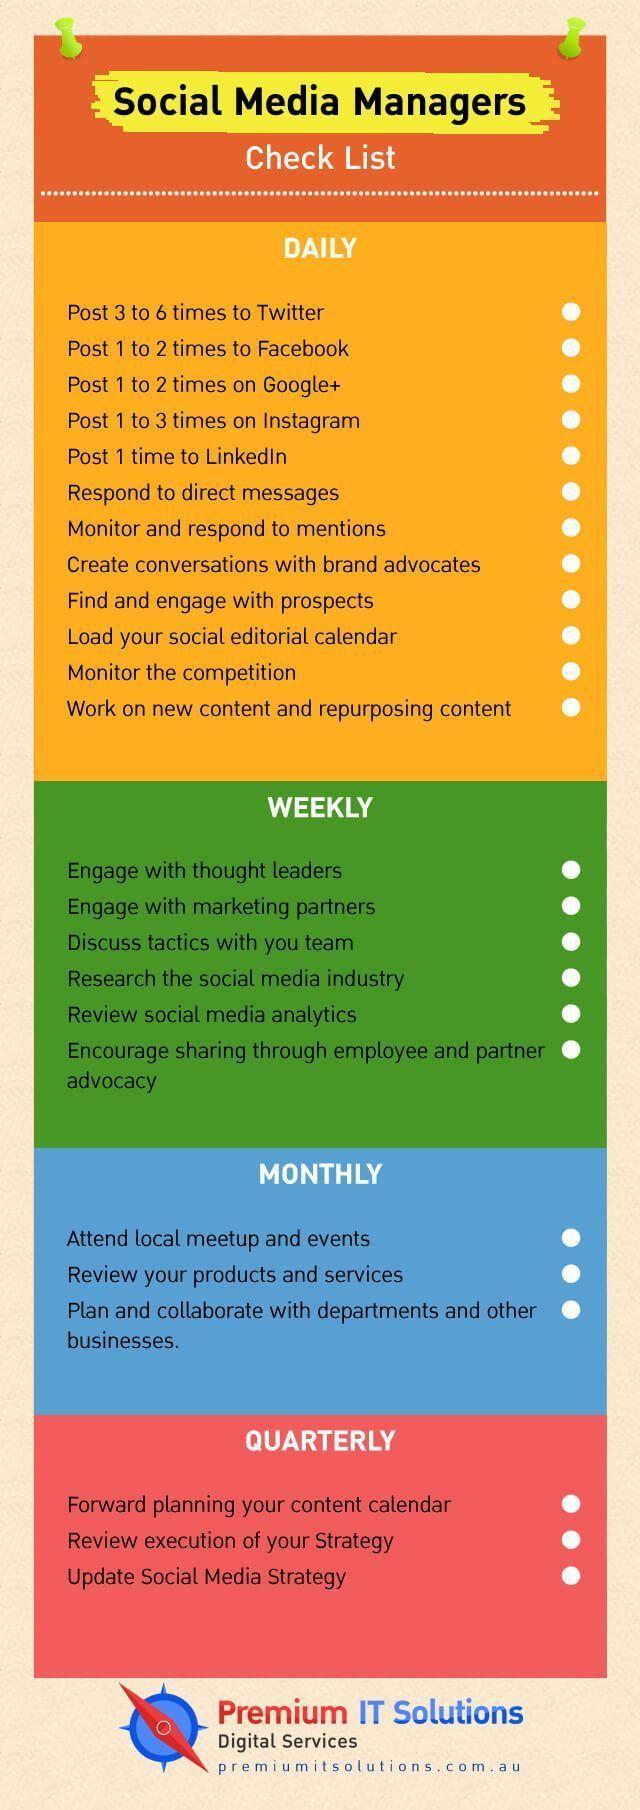 social-media-stra... Looking for fishing rods, reels or…  Latest News & Trends on #digitalmarketing | http://webworksagency.com